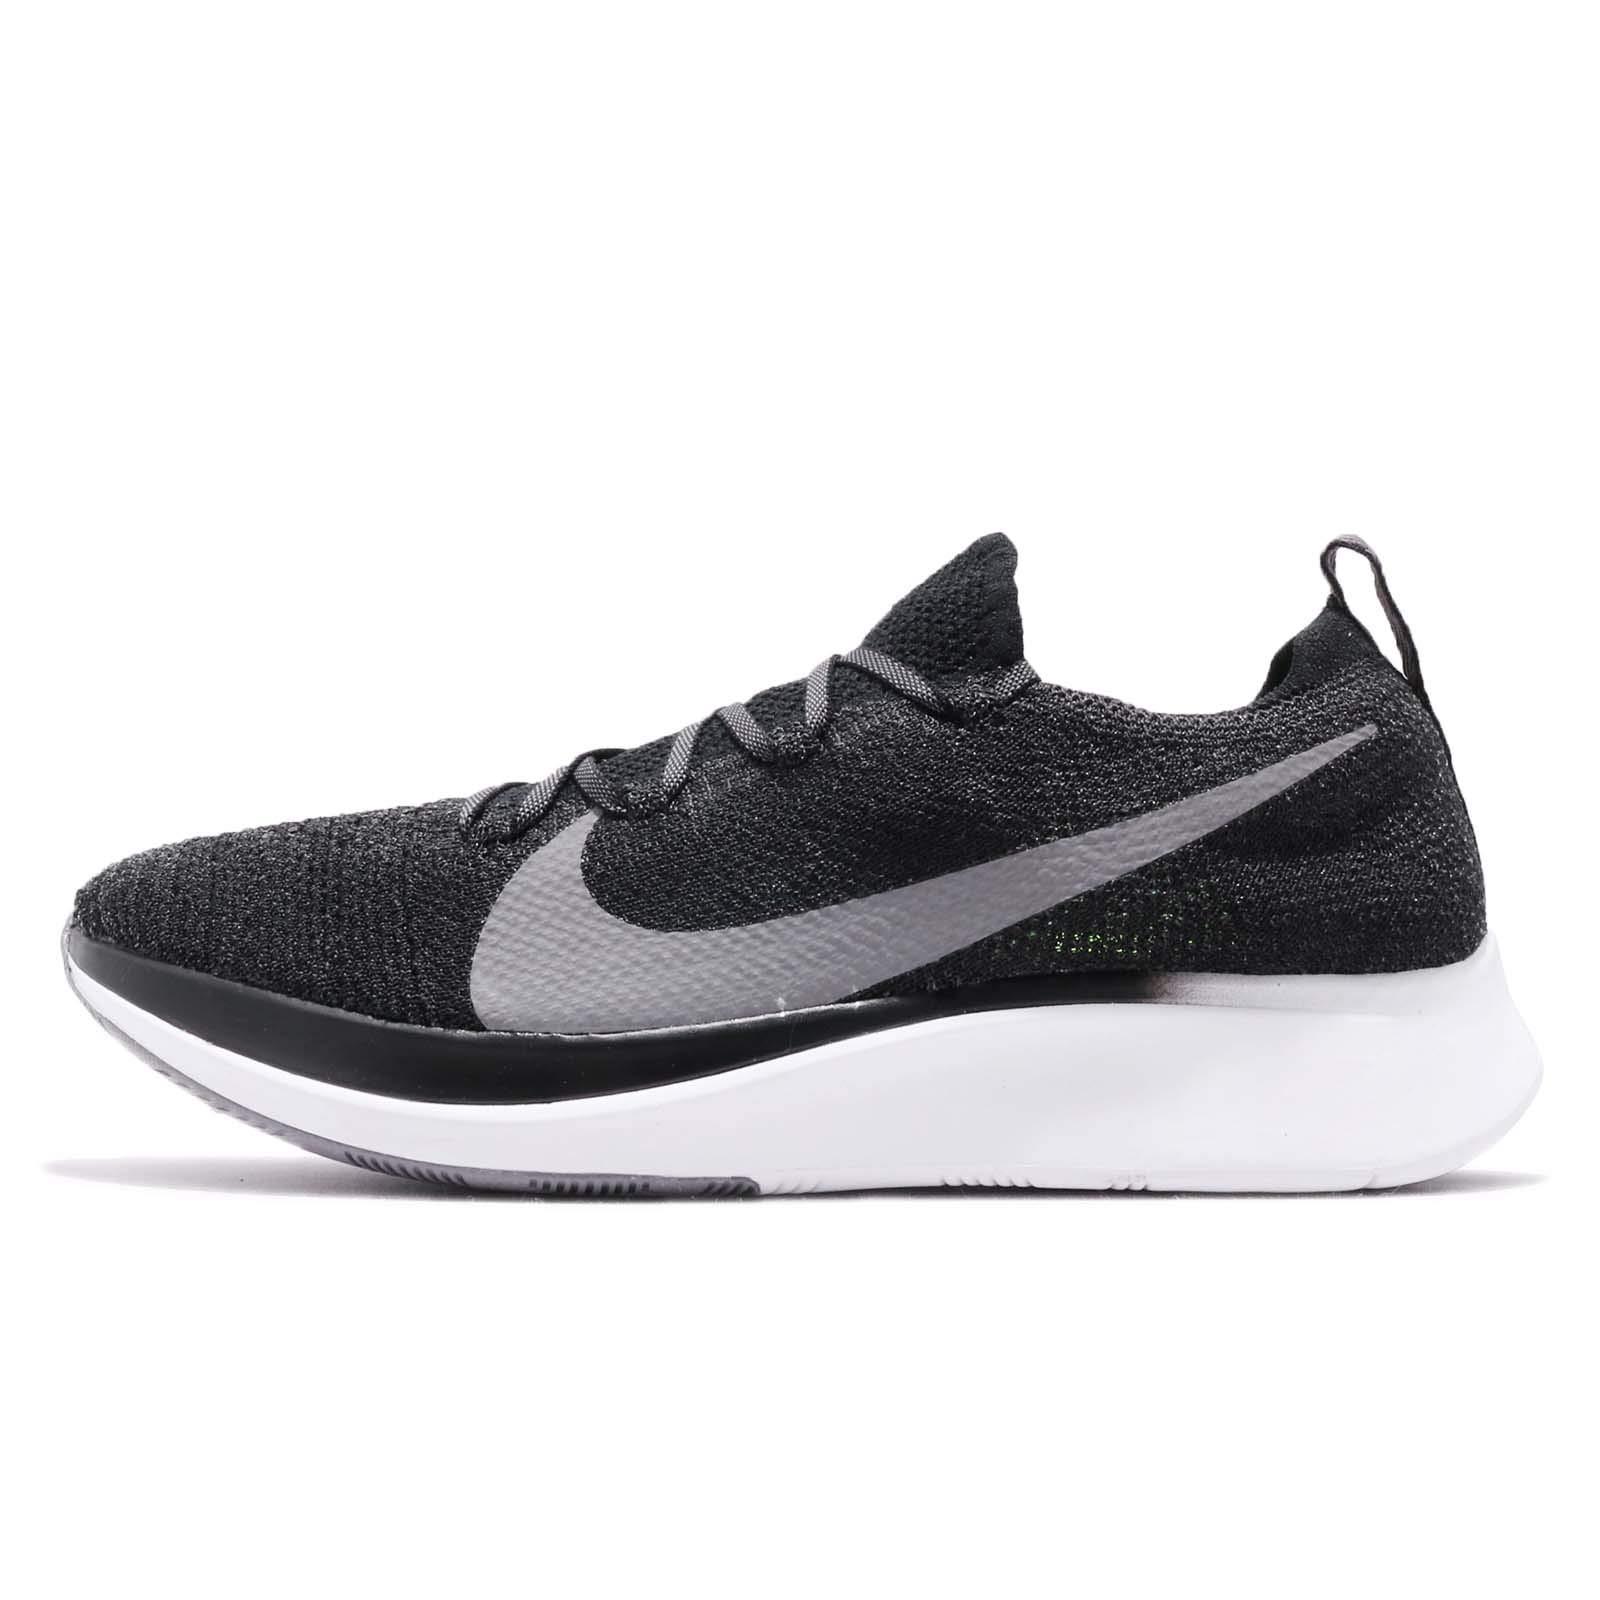 Nike Zoom Fly Flyknit Men's Running Shoe Black/Gunsmoke-White Size 7.5